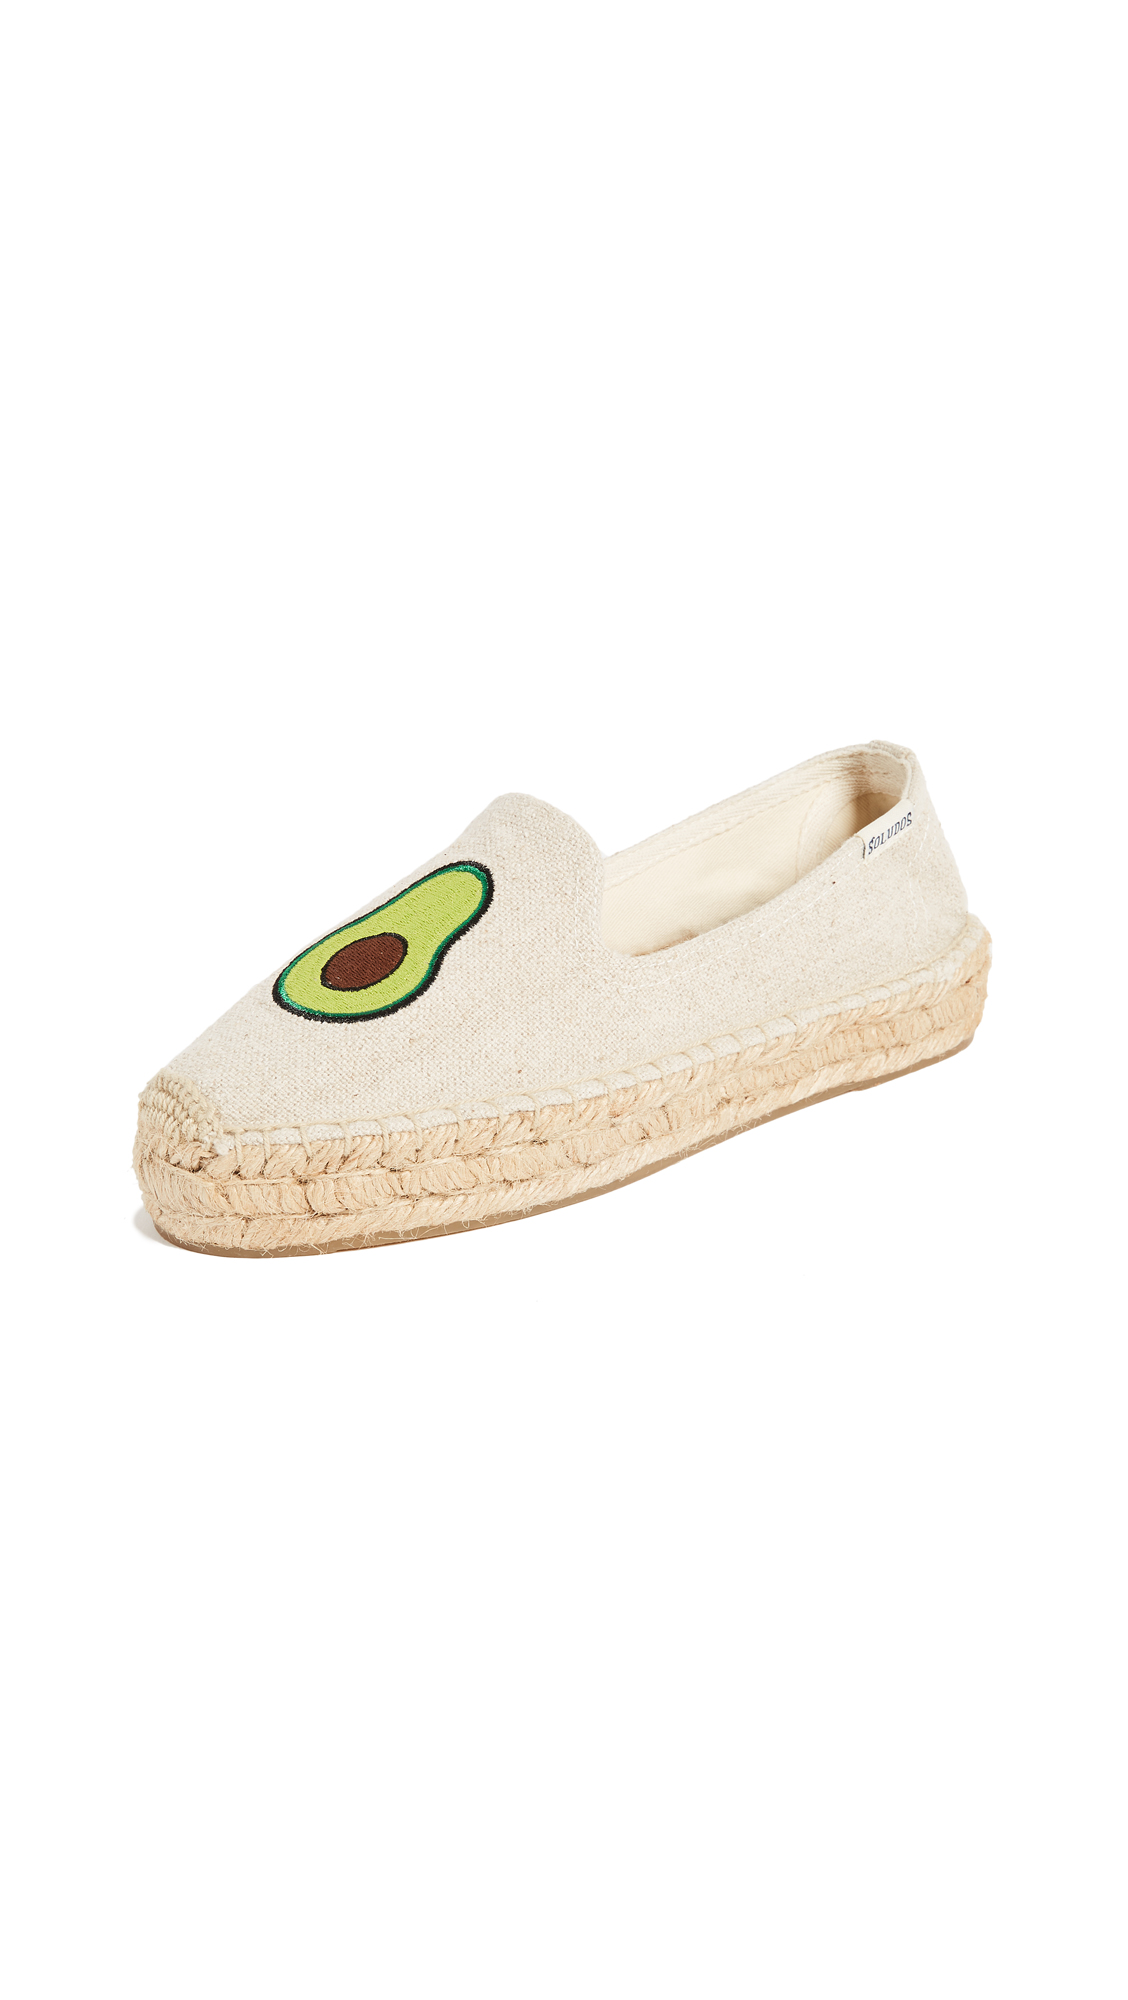 Soludos Avocado Platform Smoking Slippers - Sand